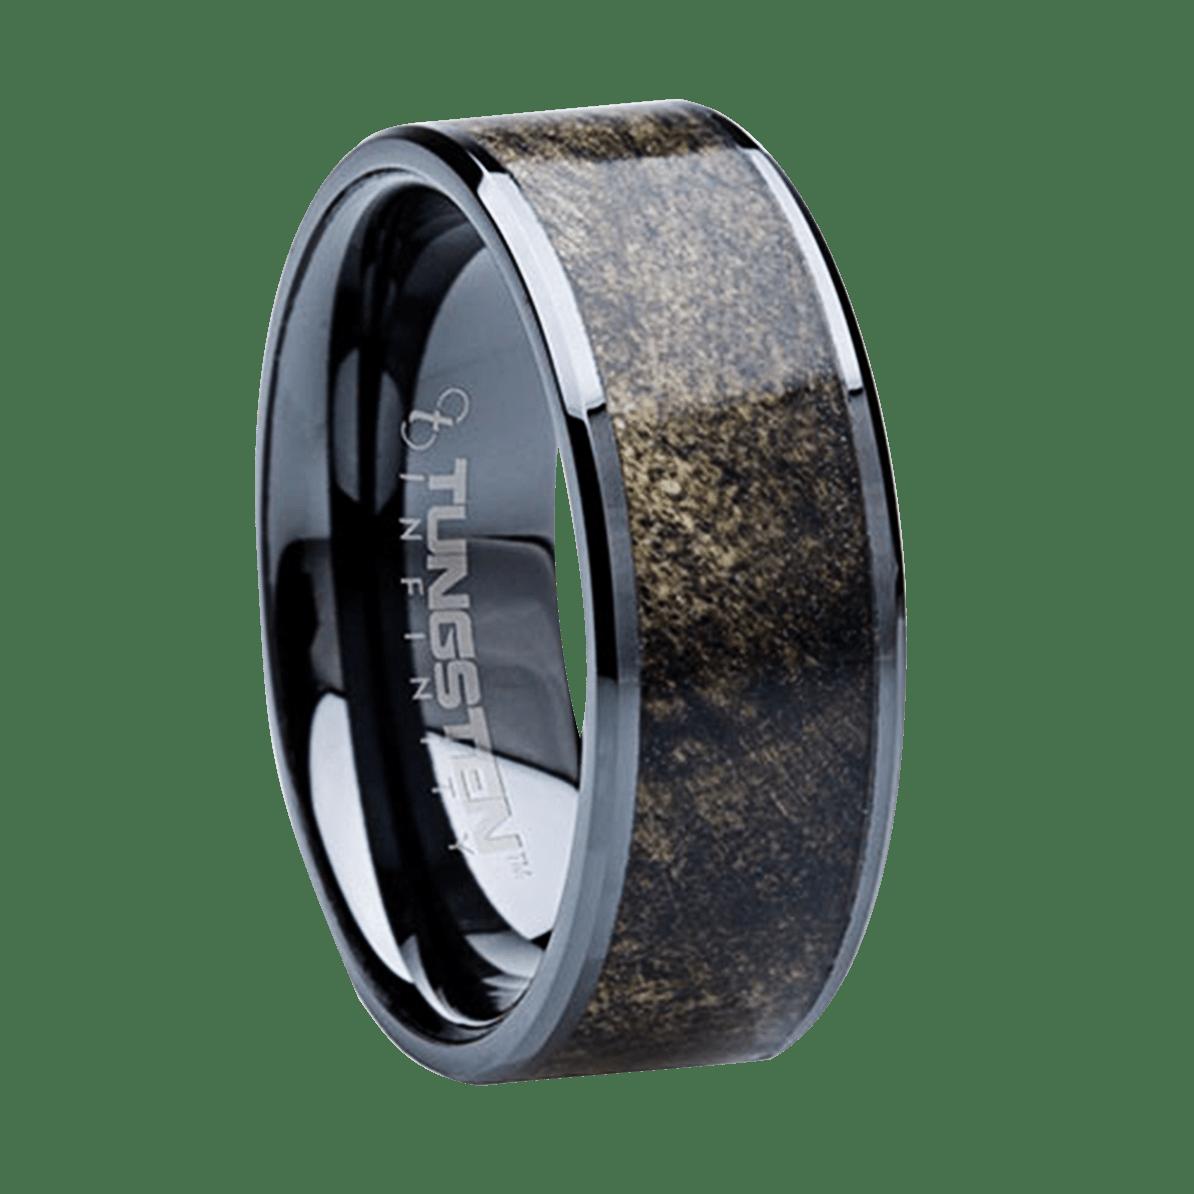 mens wedding rings titanium 8 mm Unique Mens Wedding Bands Titanium Buckeye Wood BM